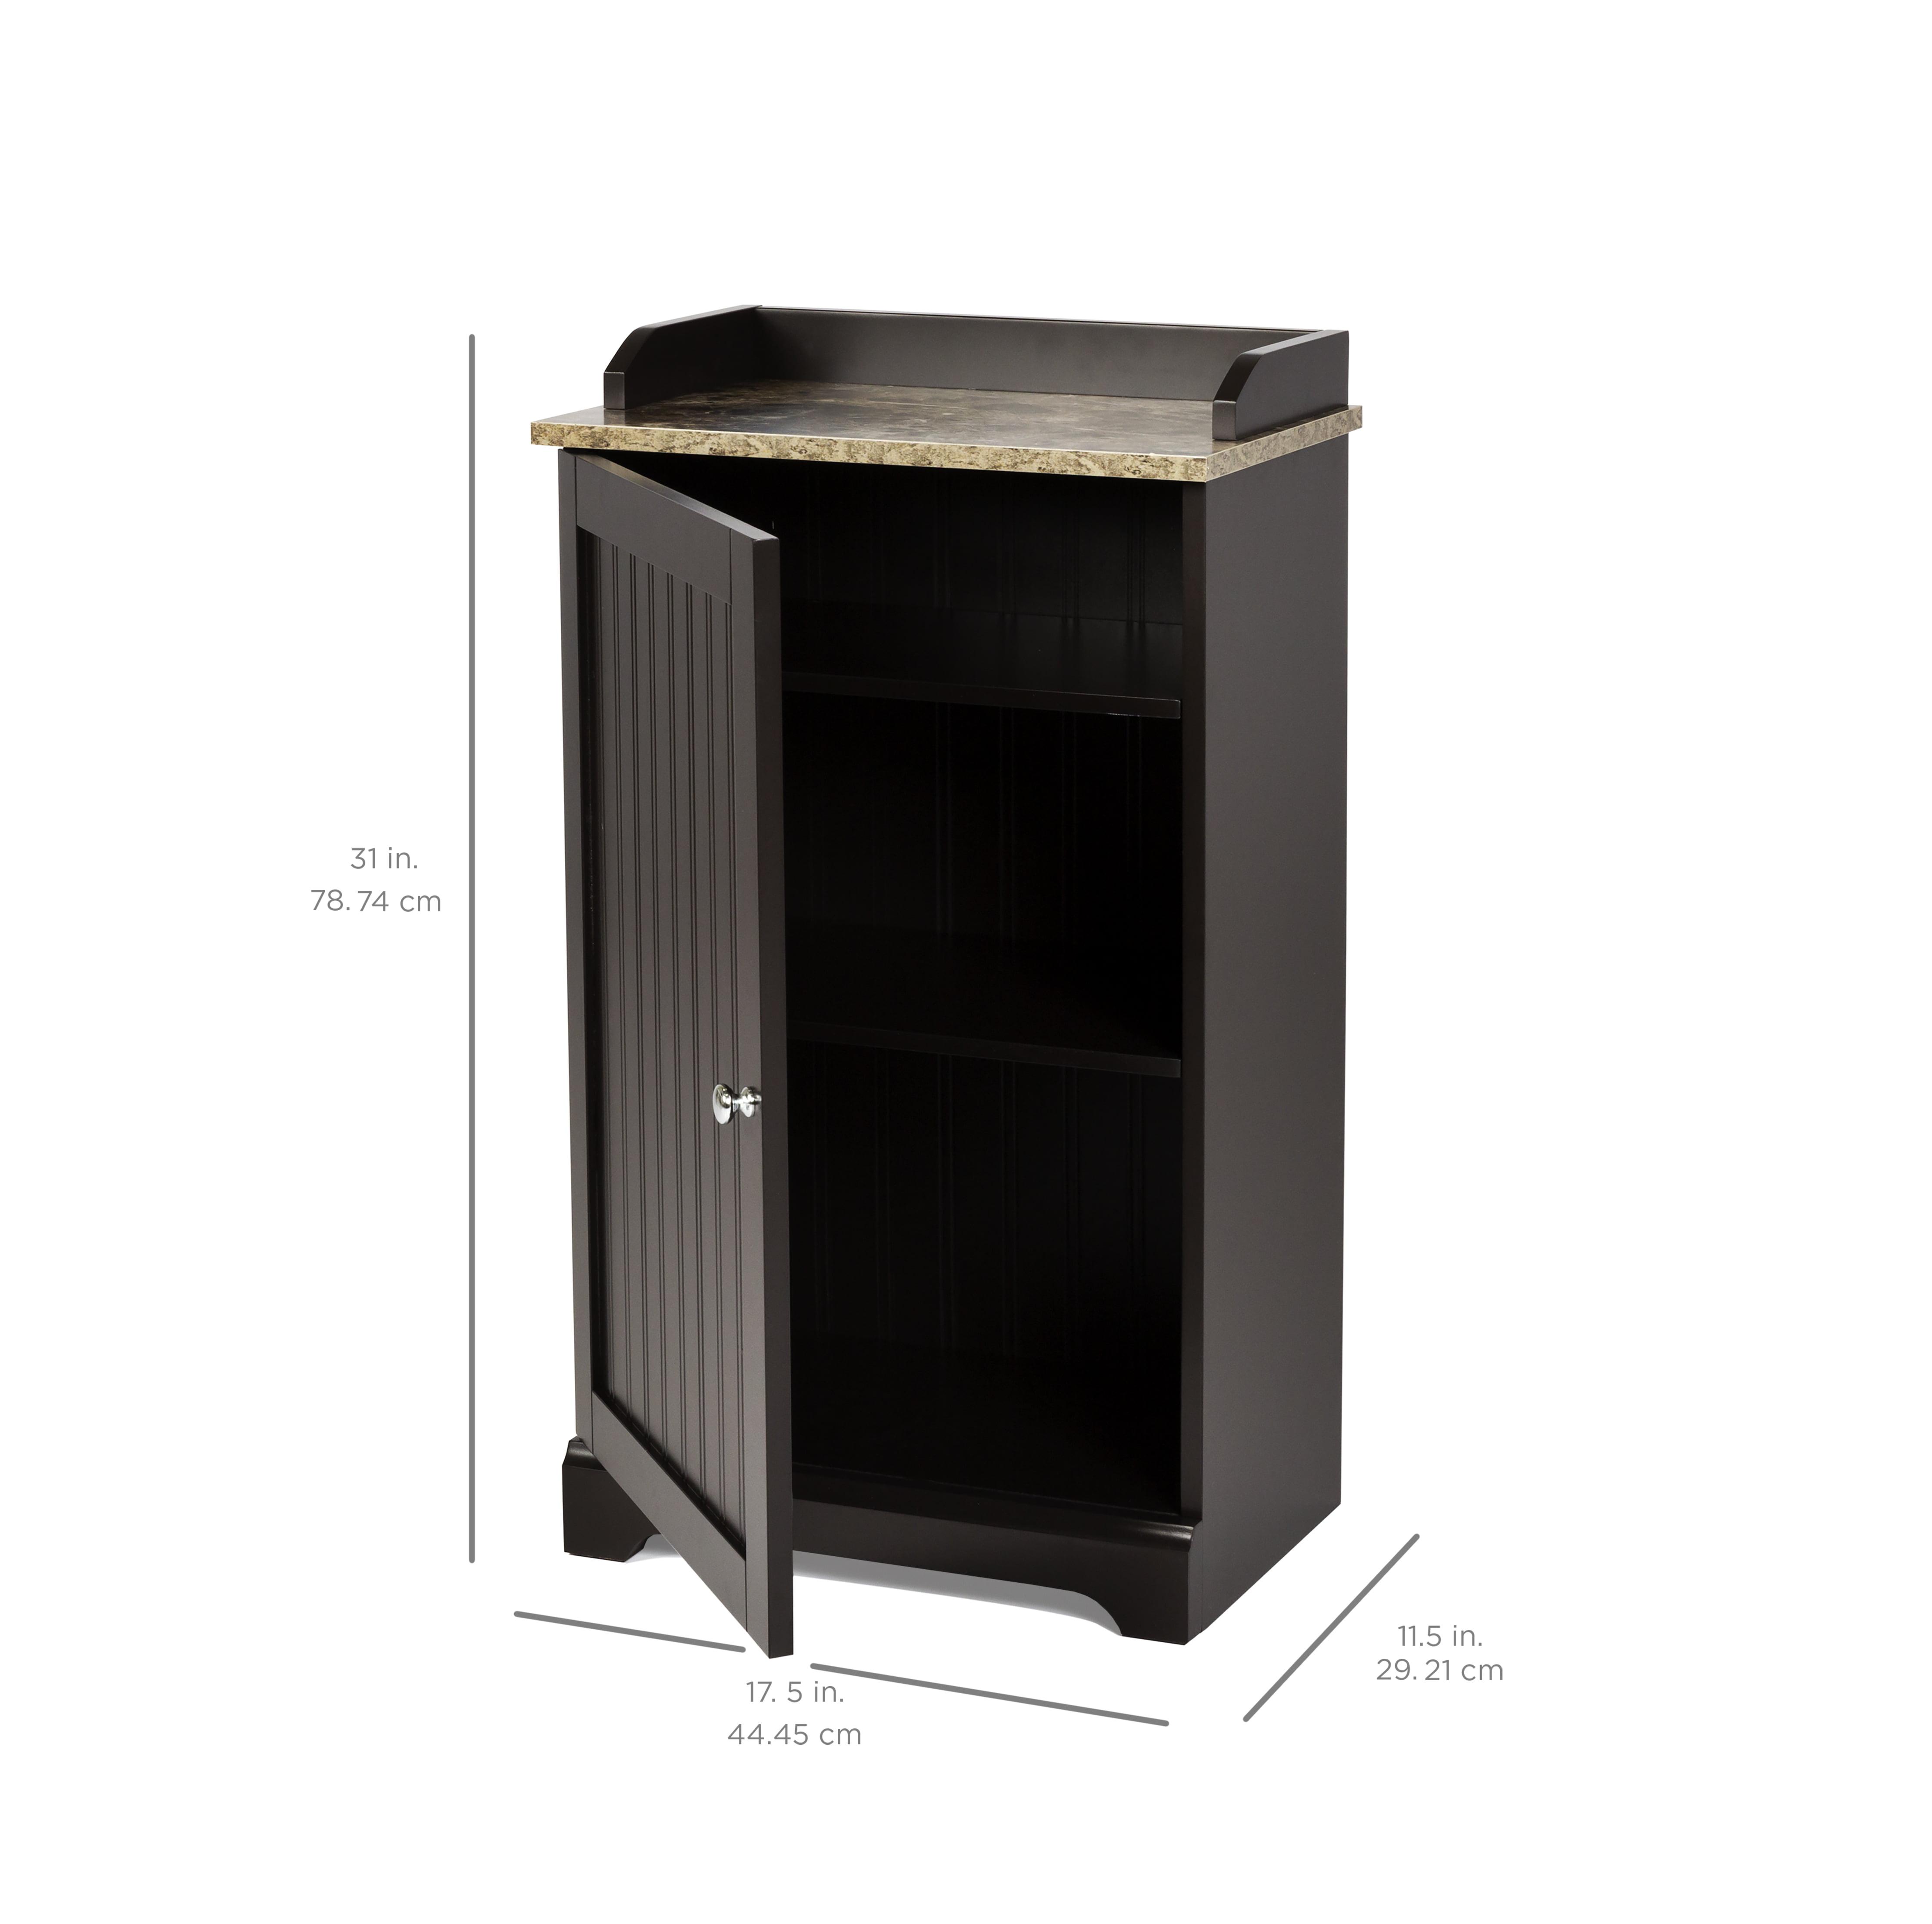 Minimalist Bathroom Toiletries: Toiletries Organizer Cabinet